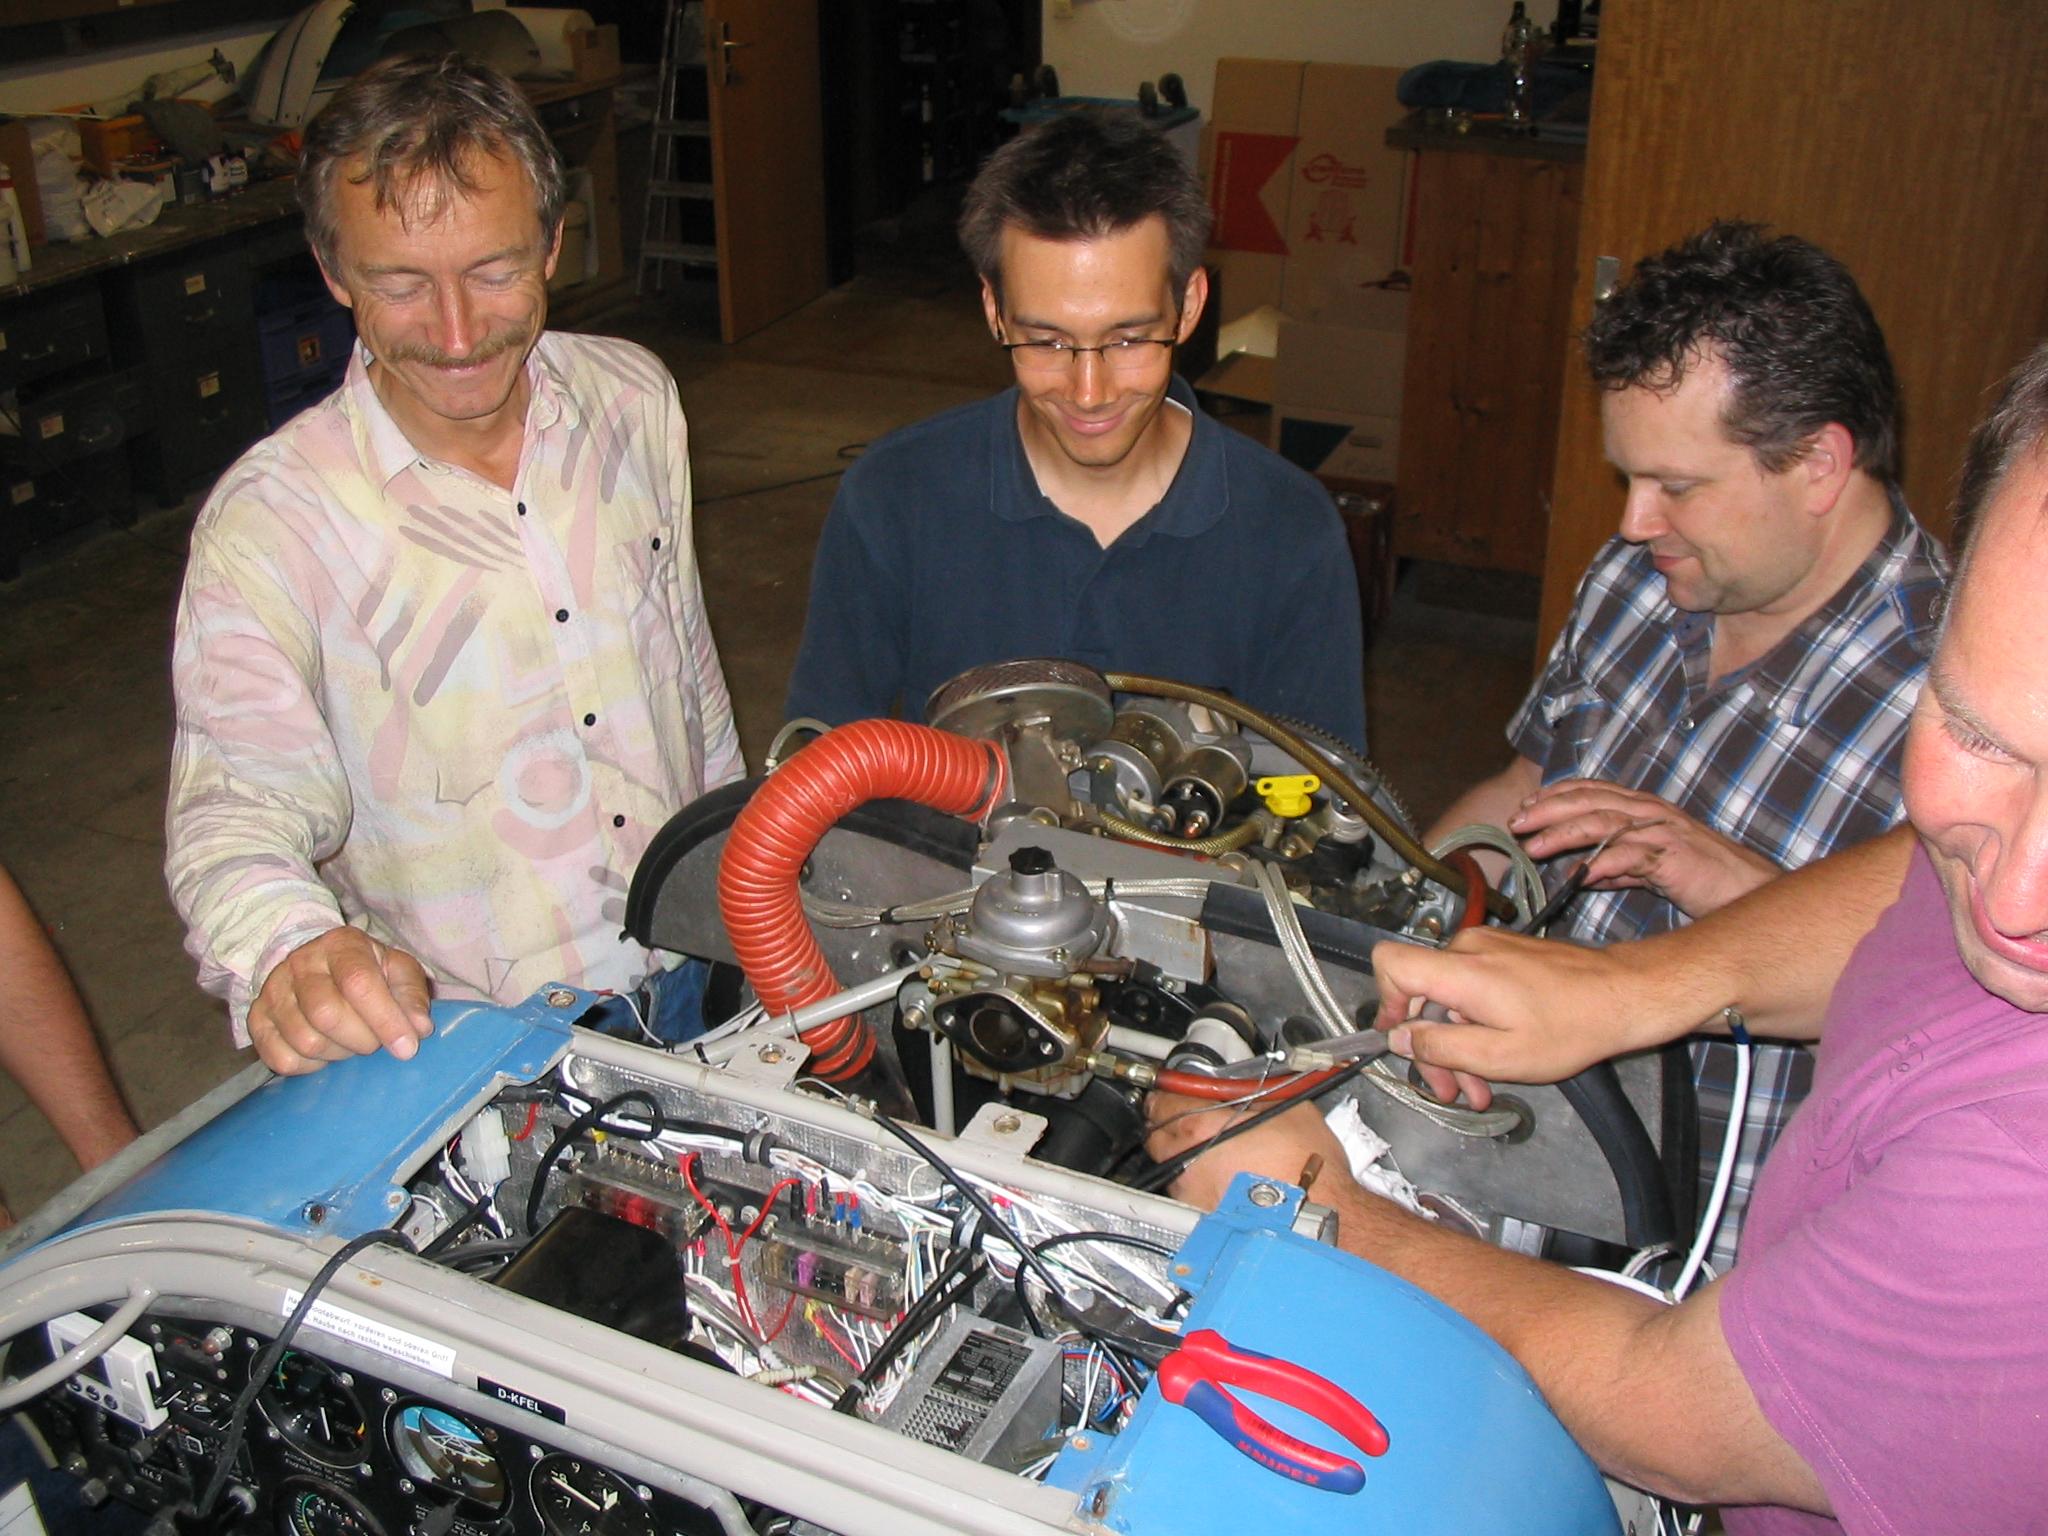 die Helfer stehen bereit (v.l. Reinhard, Stefan, Rene, Jörg)